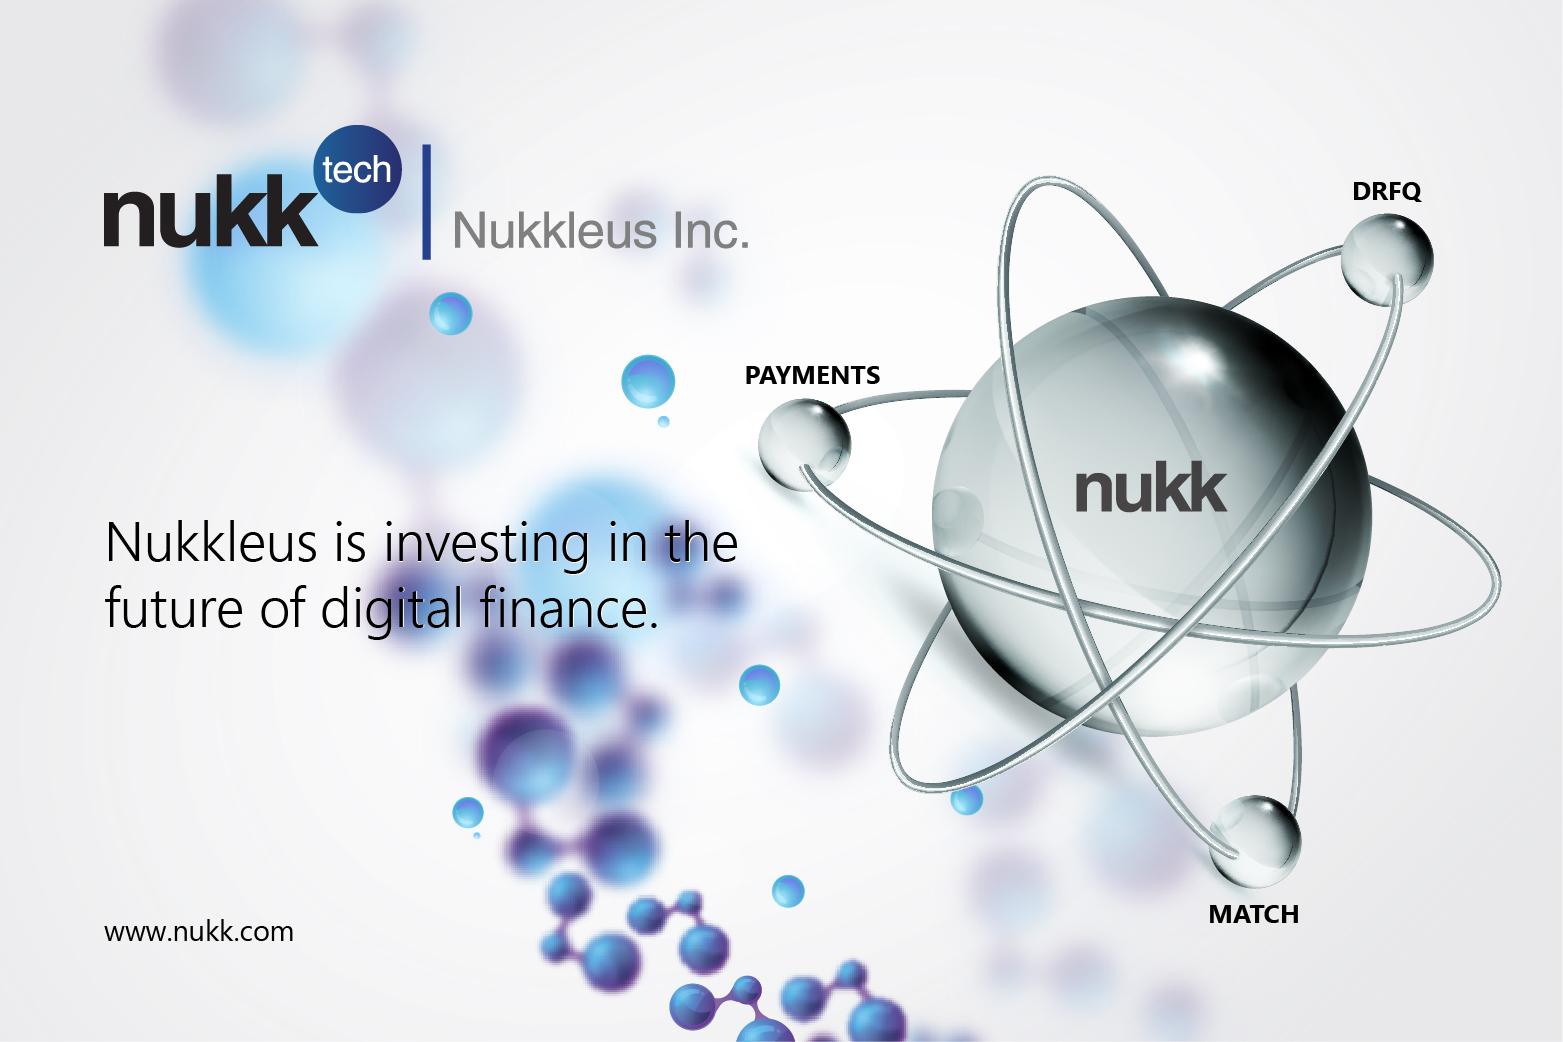 Nukkleus Seeks UK EMI License to Expand Crypto-Powered Service Offerings